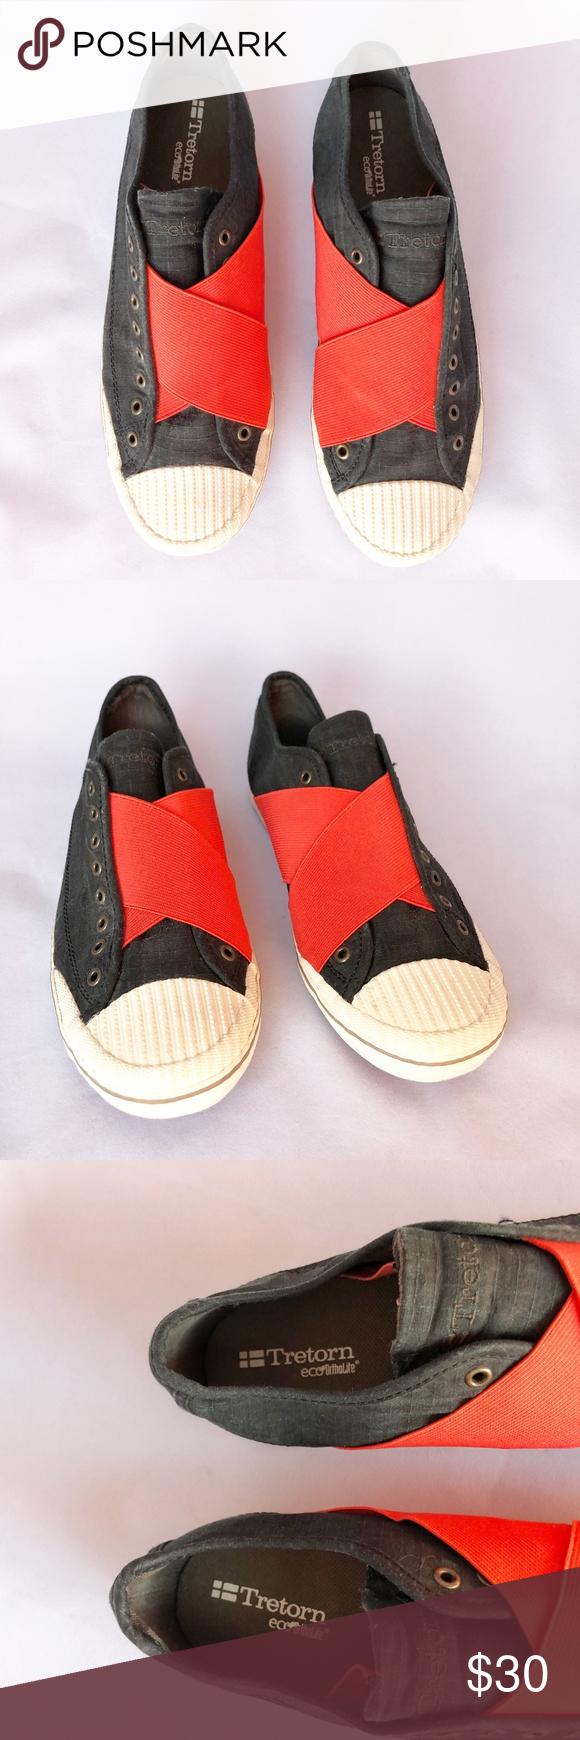 Tretorn Eco Ortholite Slip-On Sneakers